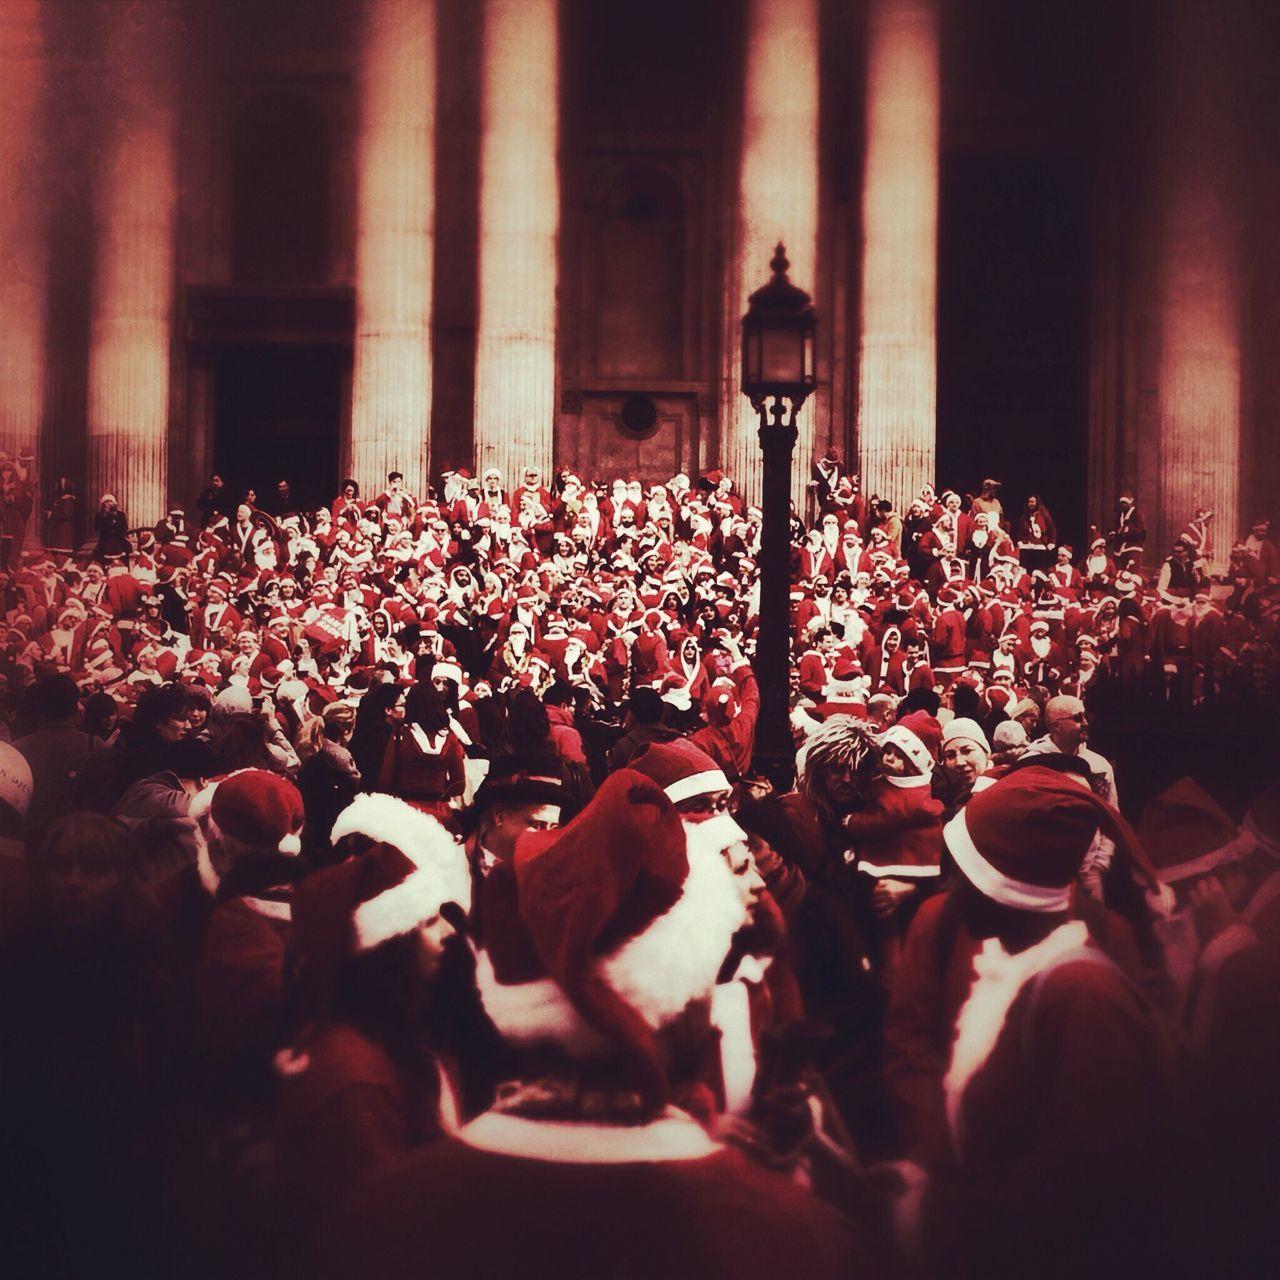 Santacon London St Pauls Cathedral Large Group Of People Crowd Lifestyles Santas Fresh On Eyeem  Art Is Everywhere